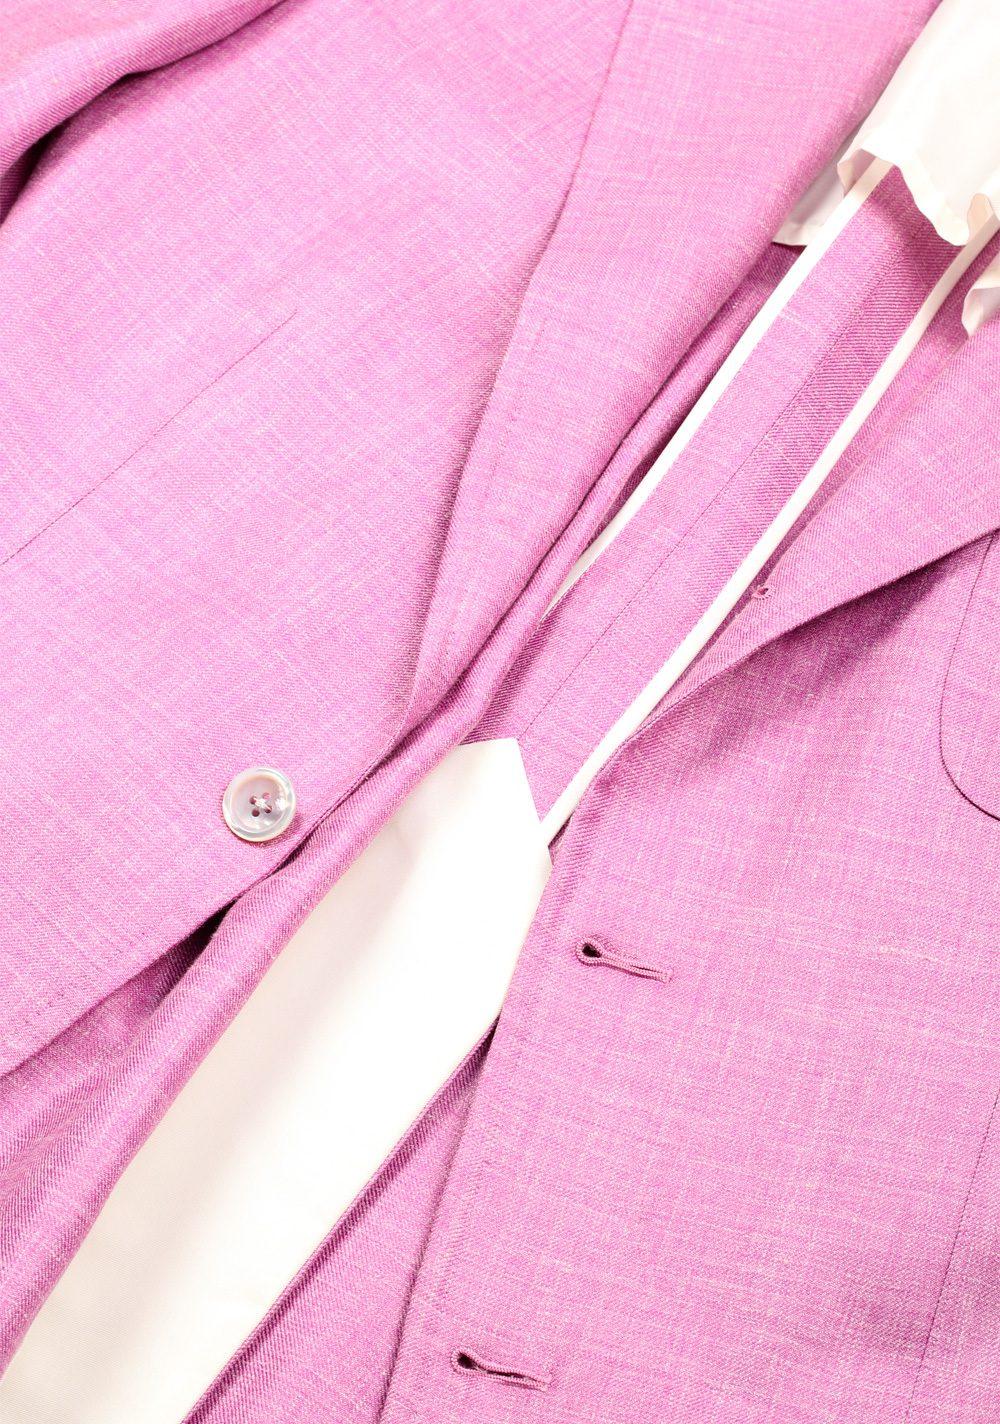 TOM FORD Spencer Lilac Sport Coat Size 48 / 38R U.S.   Costume Limité